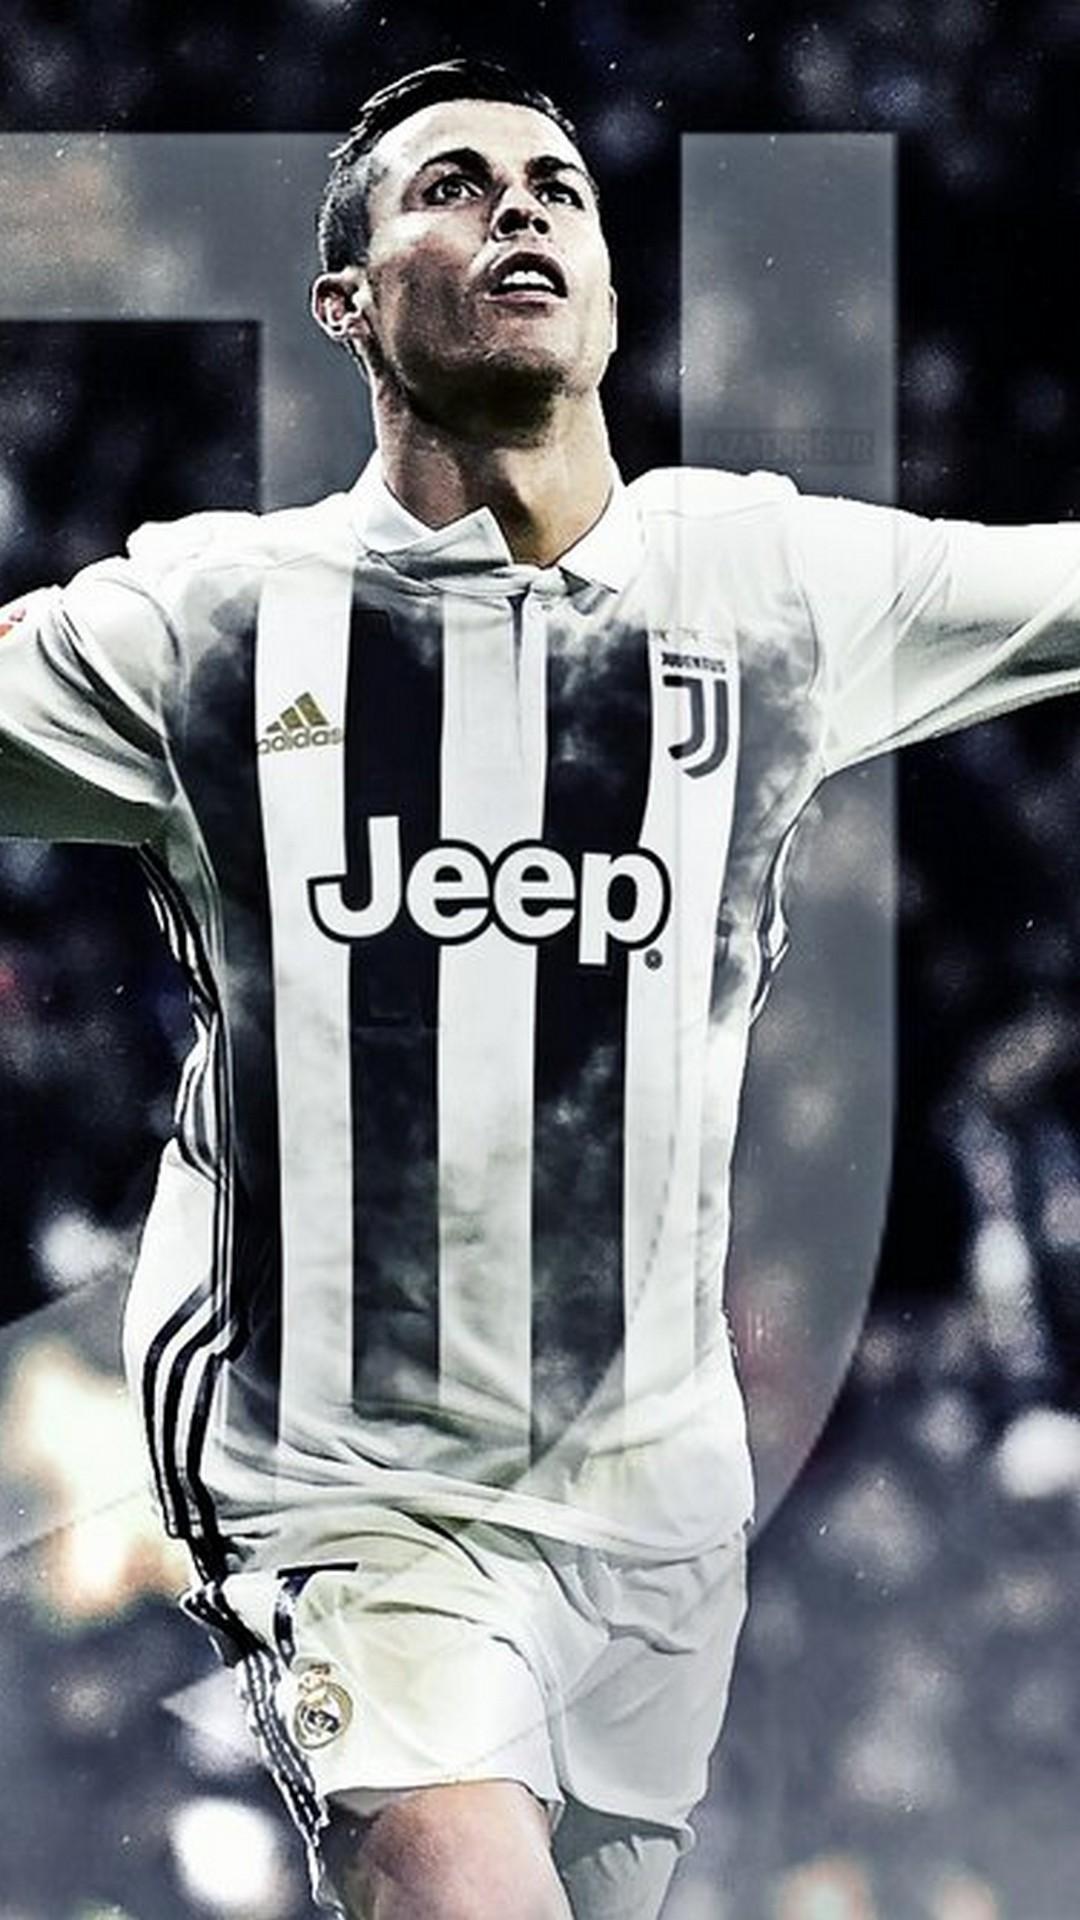 CR7 Juventus Wallpaper iPhone 2019 3D iPhone Wallpaper 1080x1920